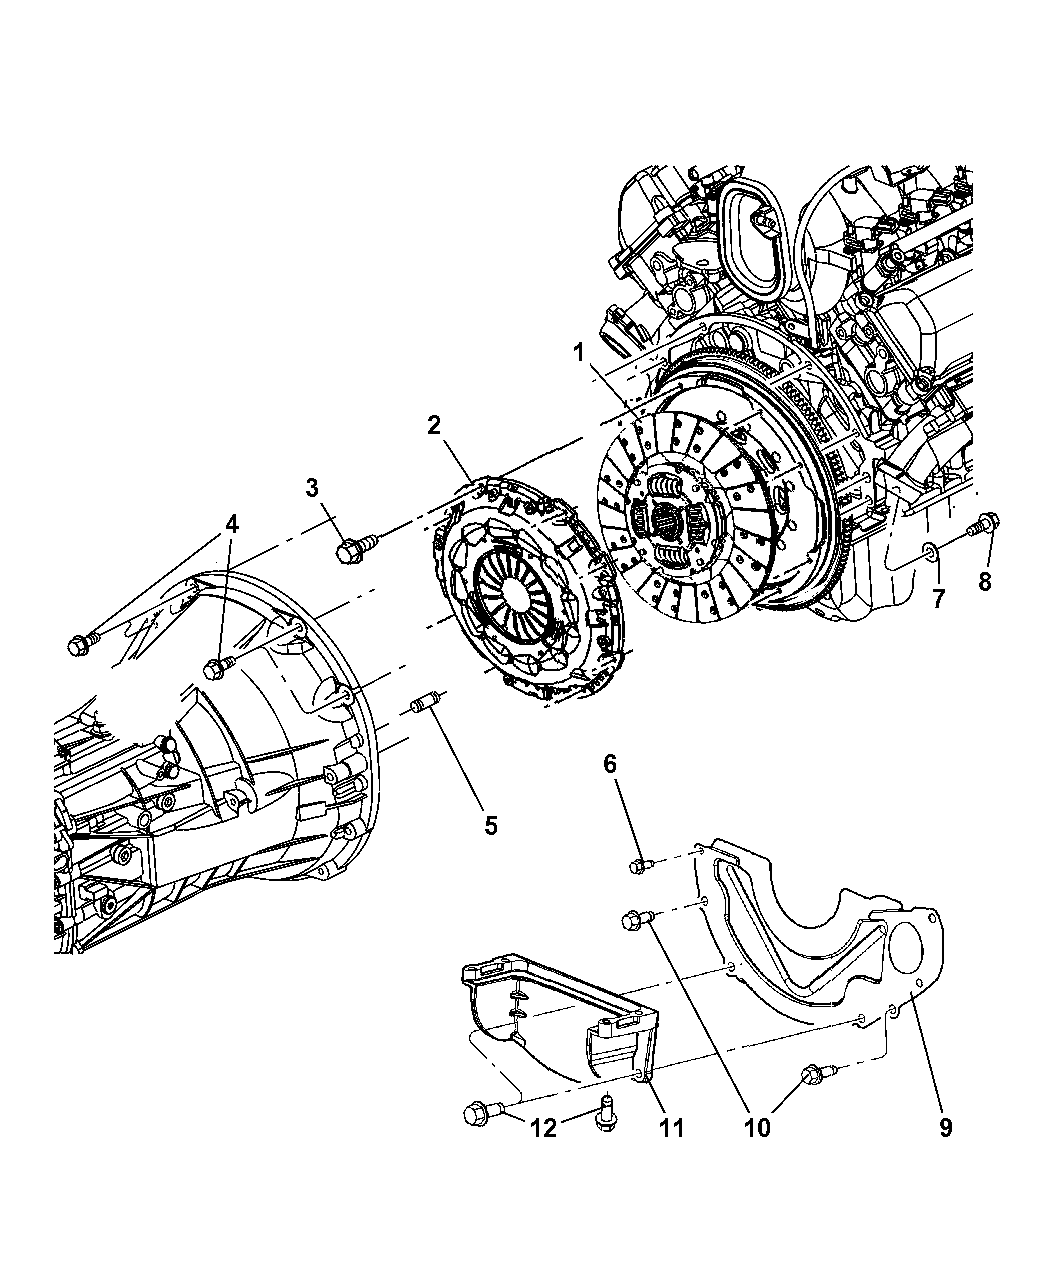 2005 Dodge Ram 1500 Clutch Assembly - Thumbnail 1